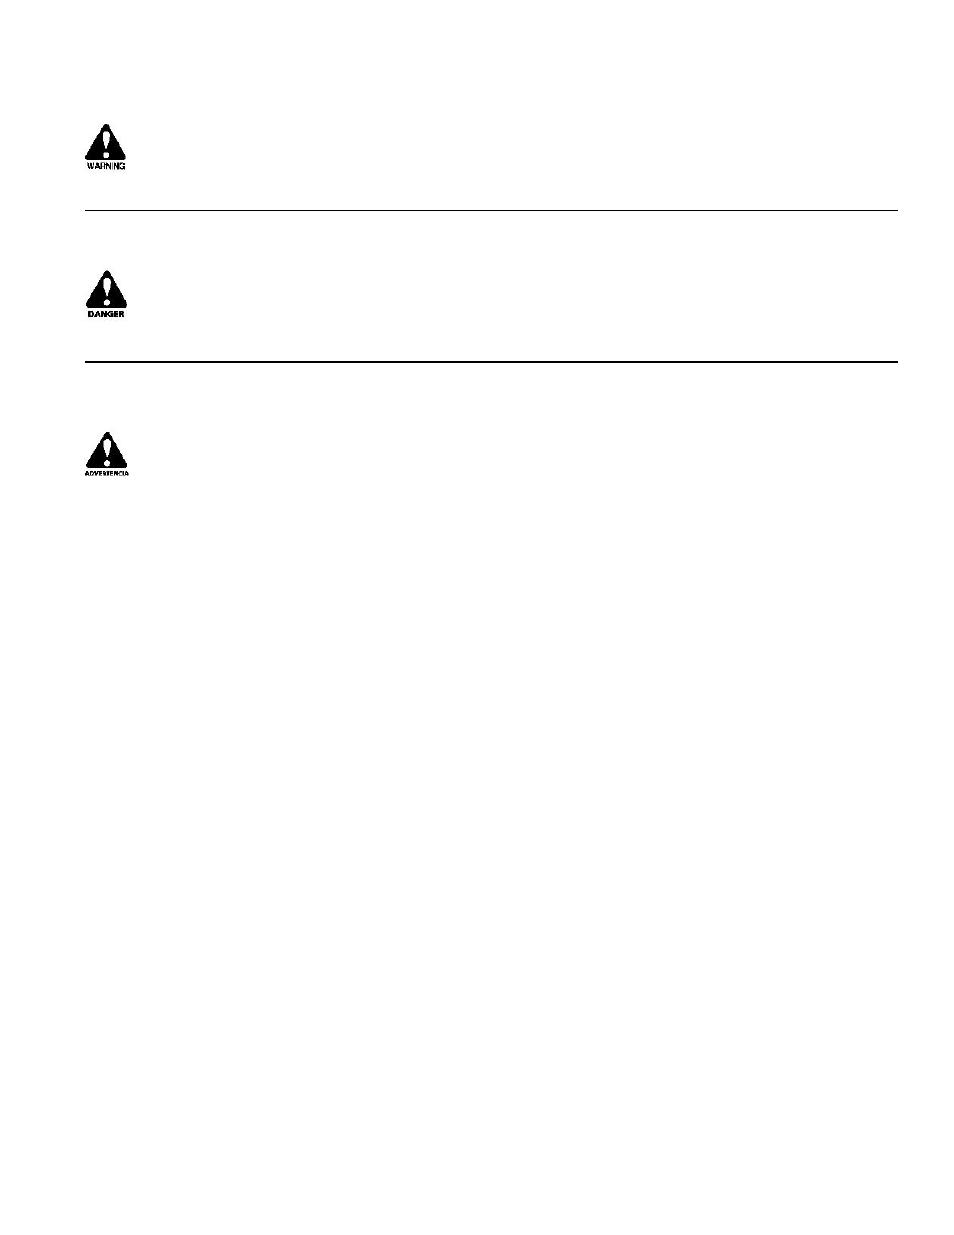 Coleman Powermate Pro Gen 5000 Service Manual